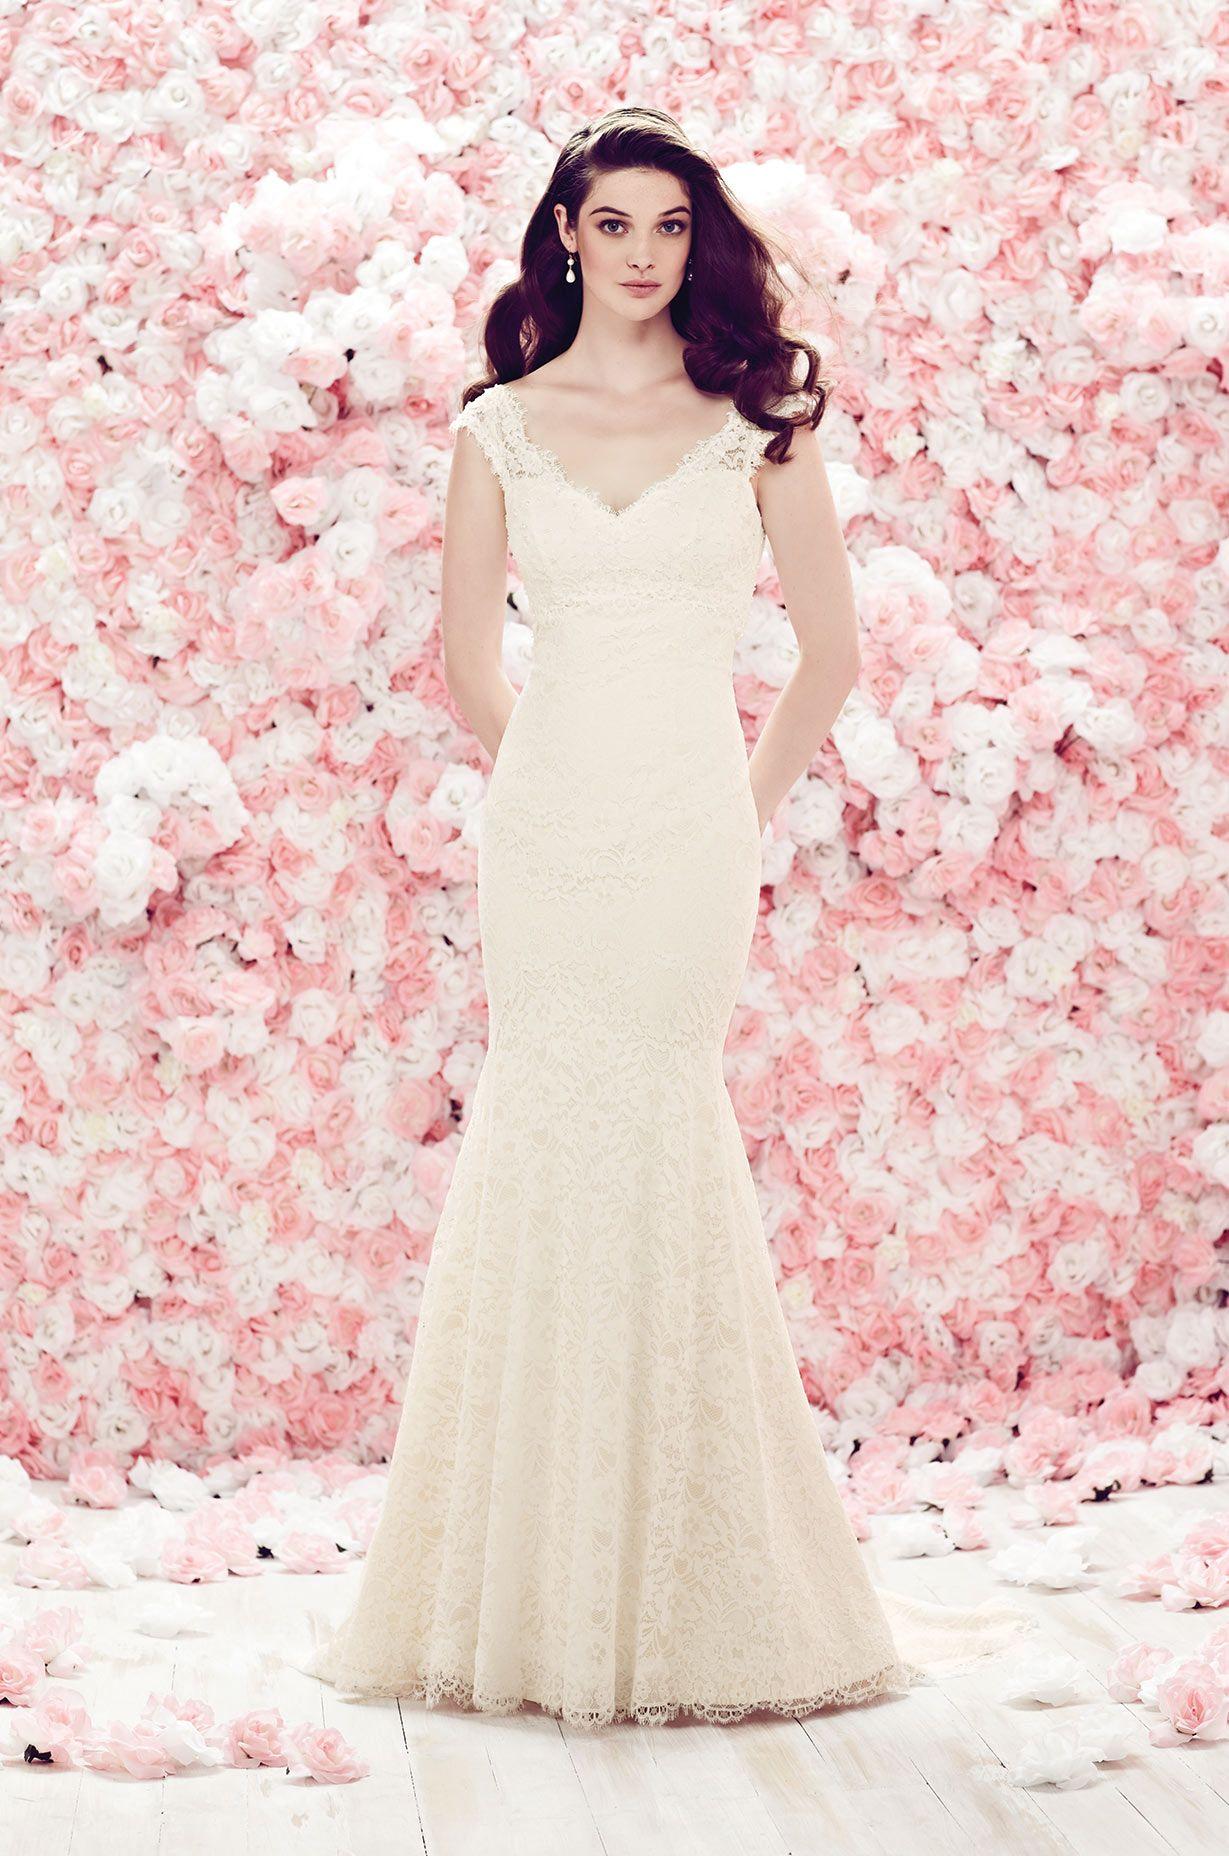 Beaded Empire Lace Wedding Dress - Style #1864 | Pinterest ...